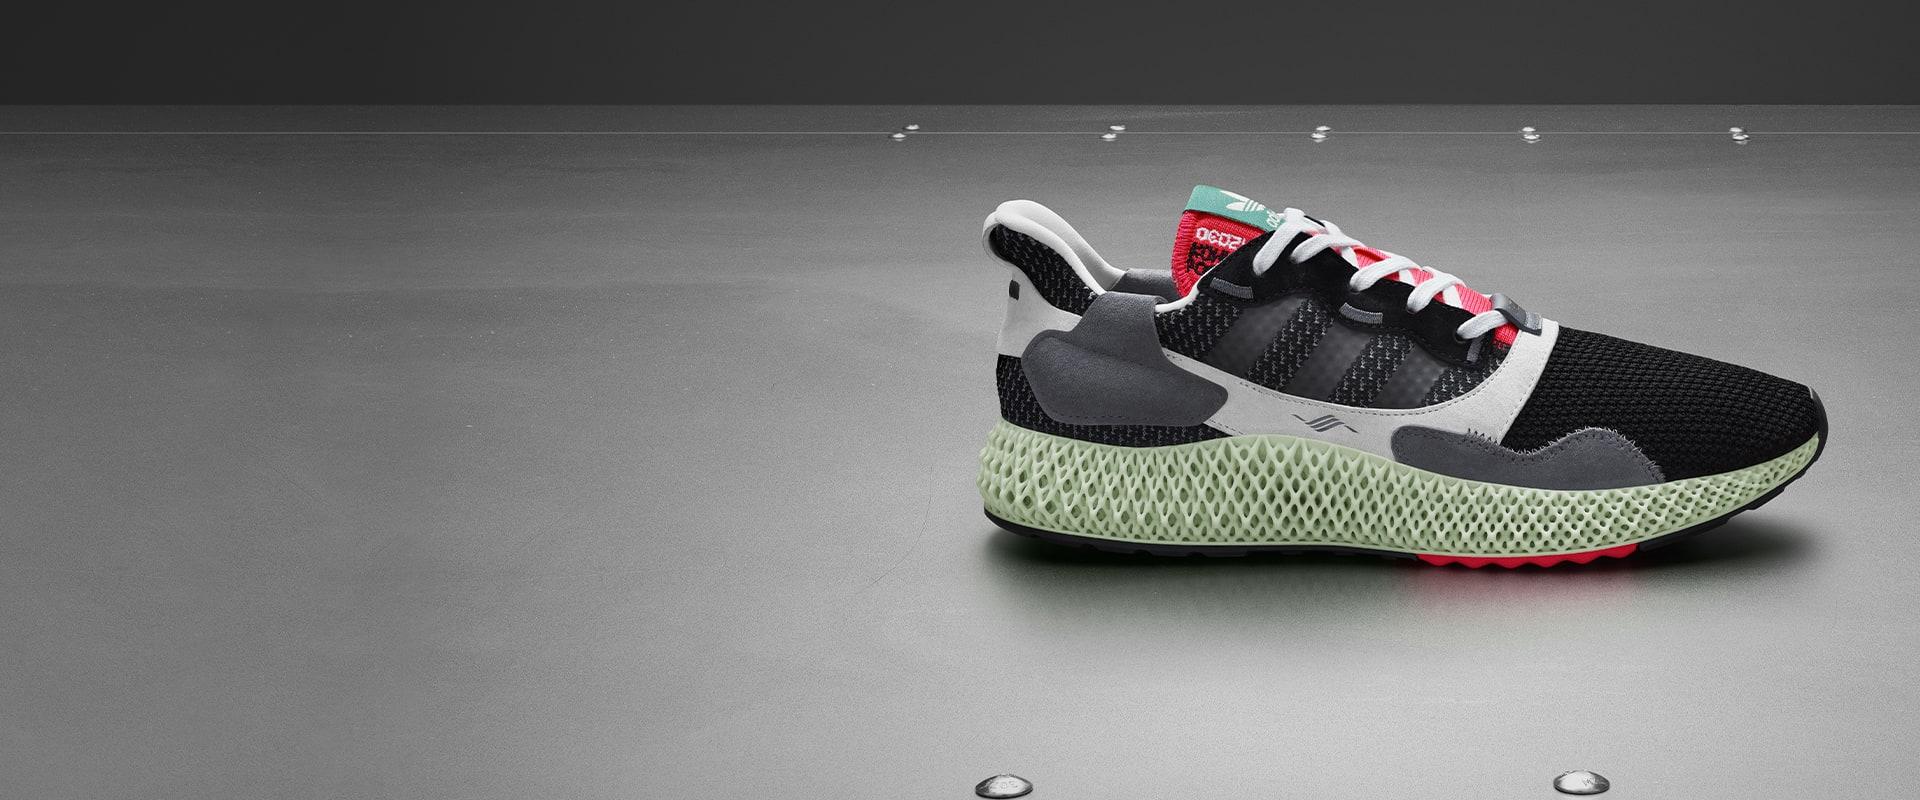 wholesale dealer 5c136 03624 ZX 4000 4D  a futuristic interpretation of adidas heritage, arriving May  25th. App exclusive.